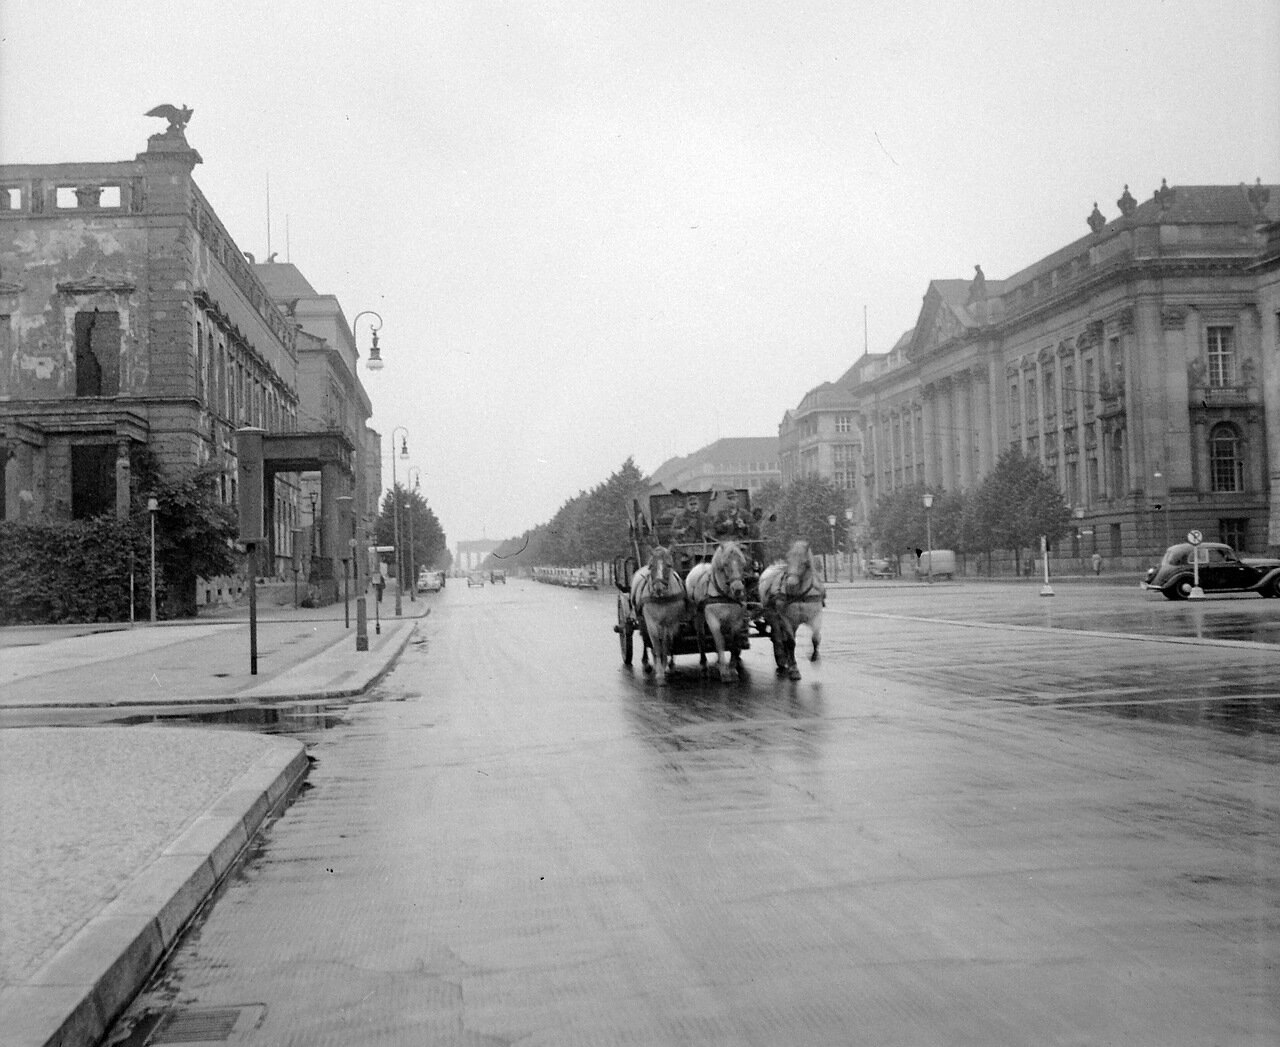 1956. Берлин, Восточный Берлин, Унтер-ден-Линден. На фоне Бранденбургских ворот